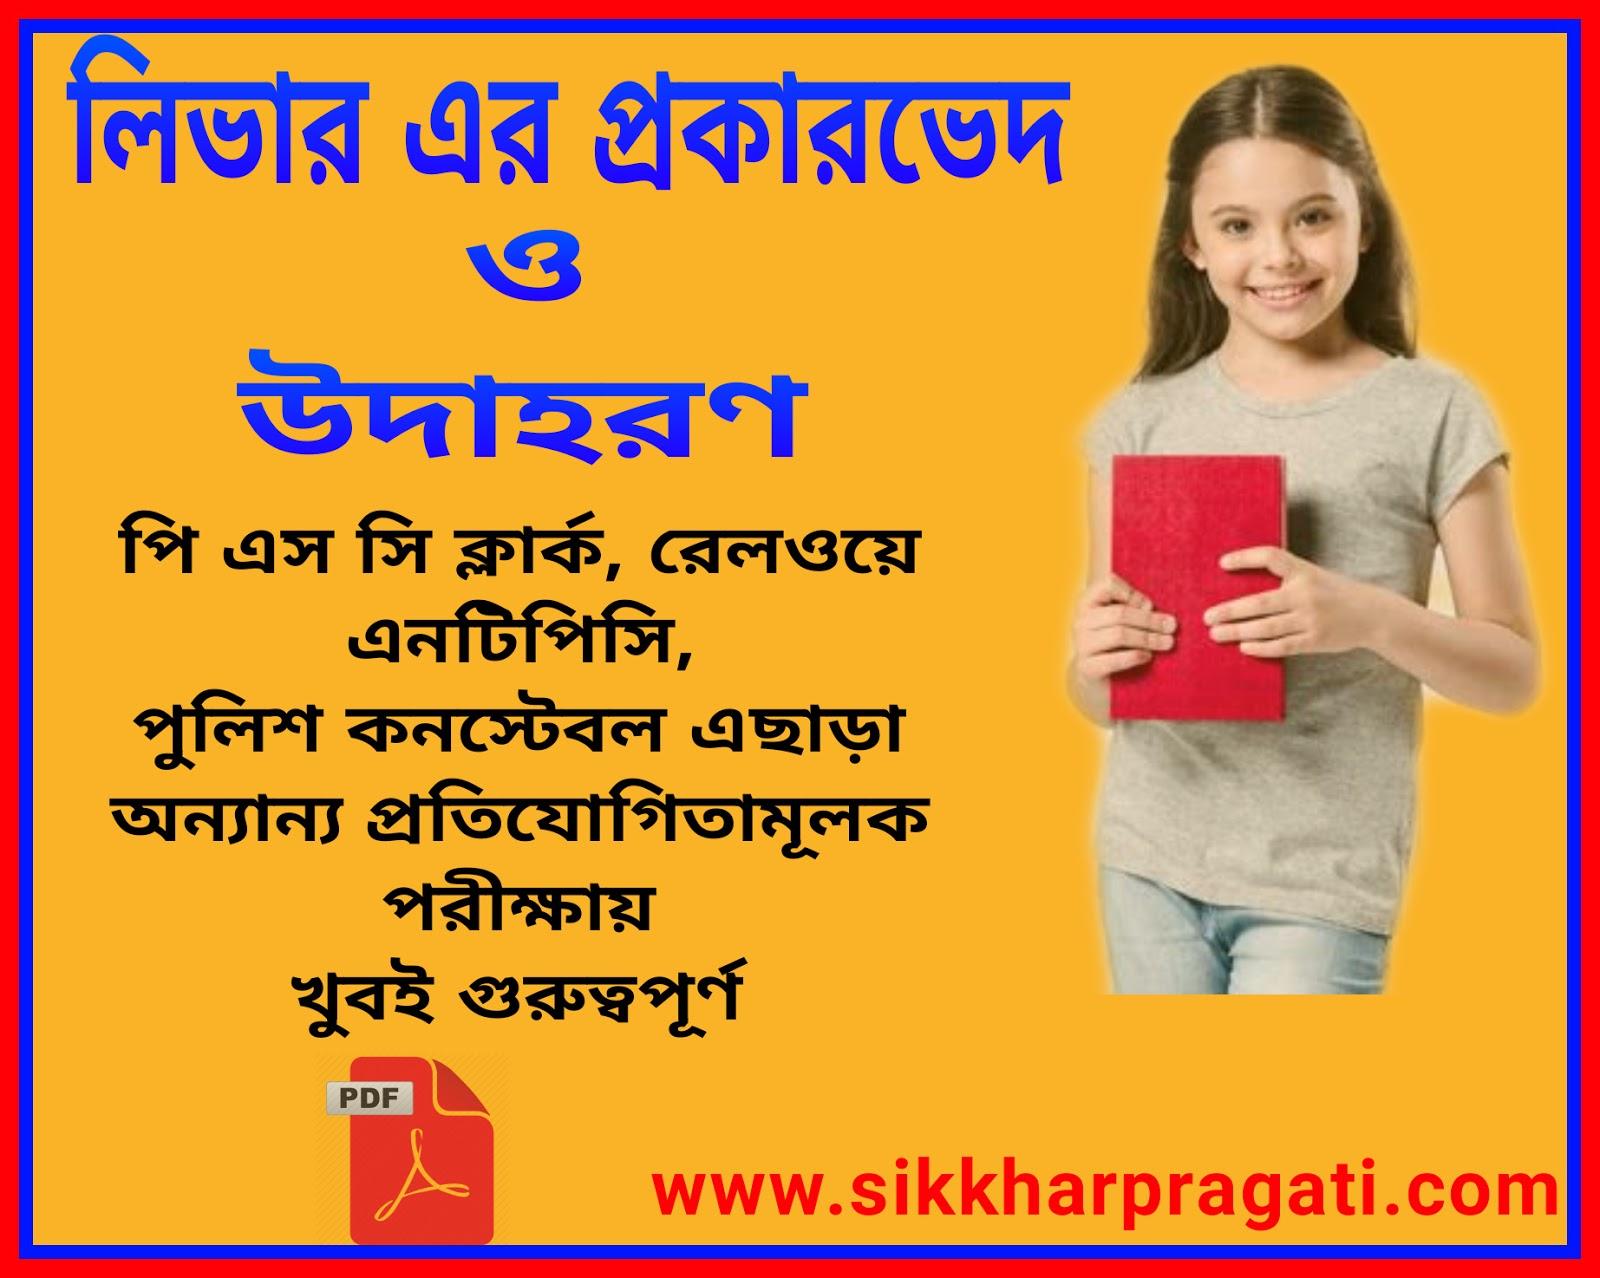 Types and examples of liver Pdf in Bengali লিভার এর প্রকারভেদ ও উদাহরণ